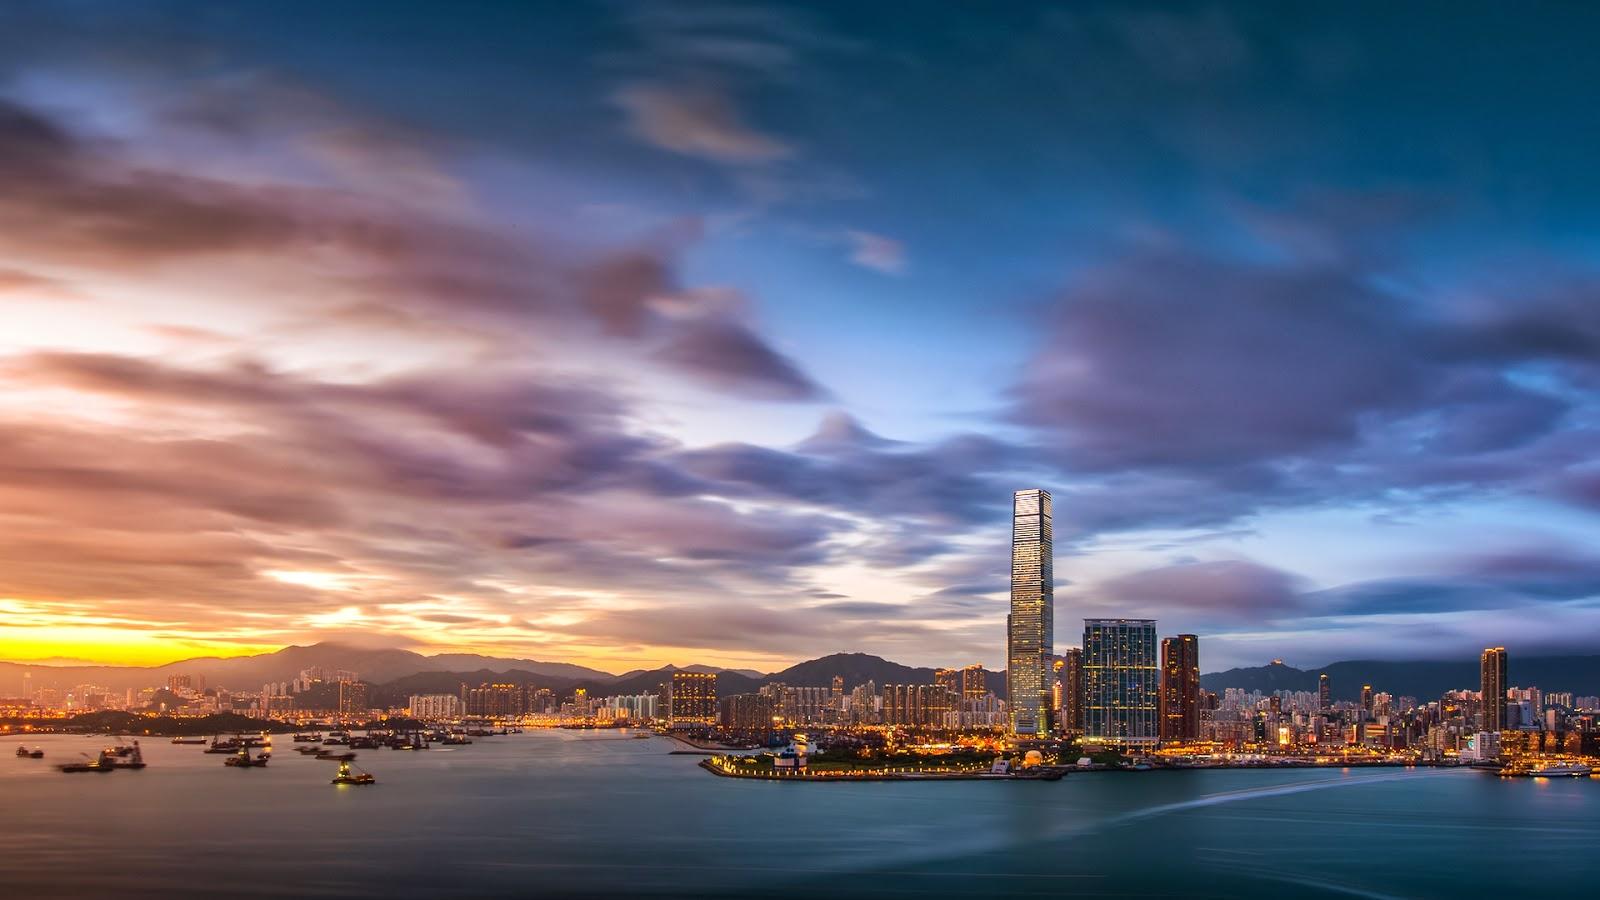 169 Beautiful Places On Earth Hong Kong Sunset Wallpaper